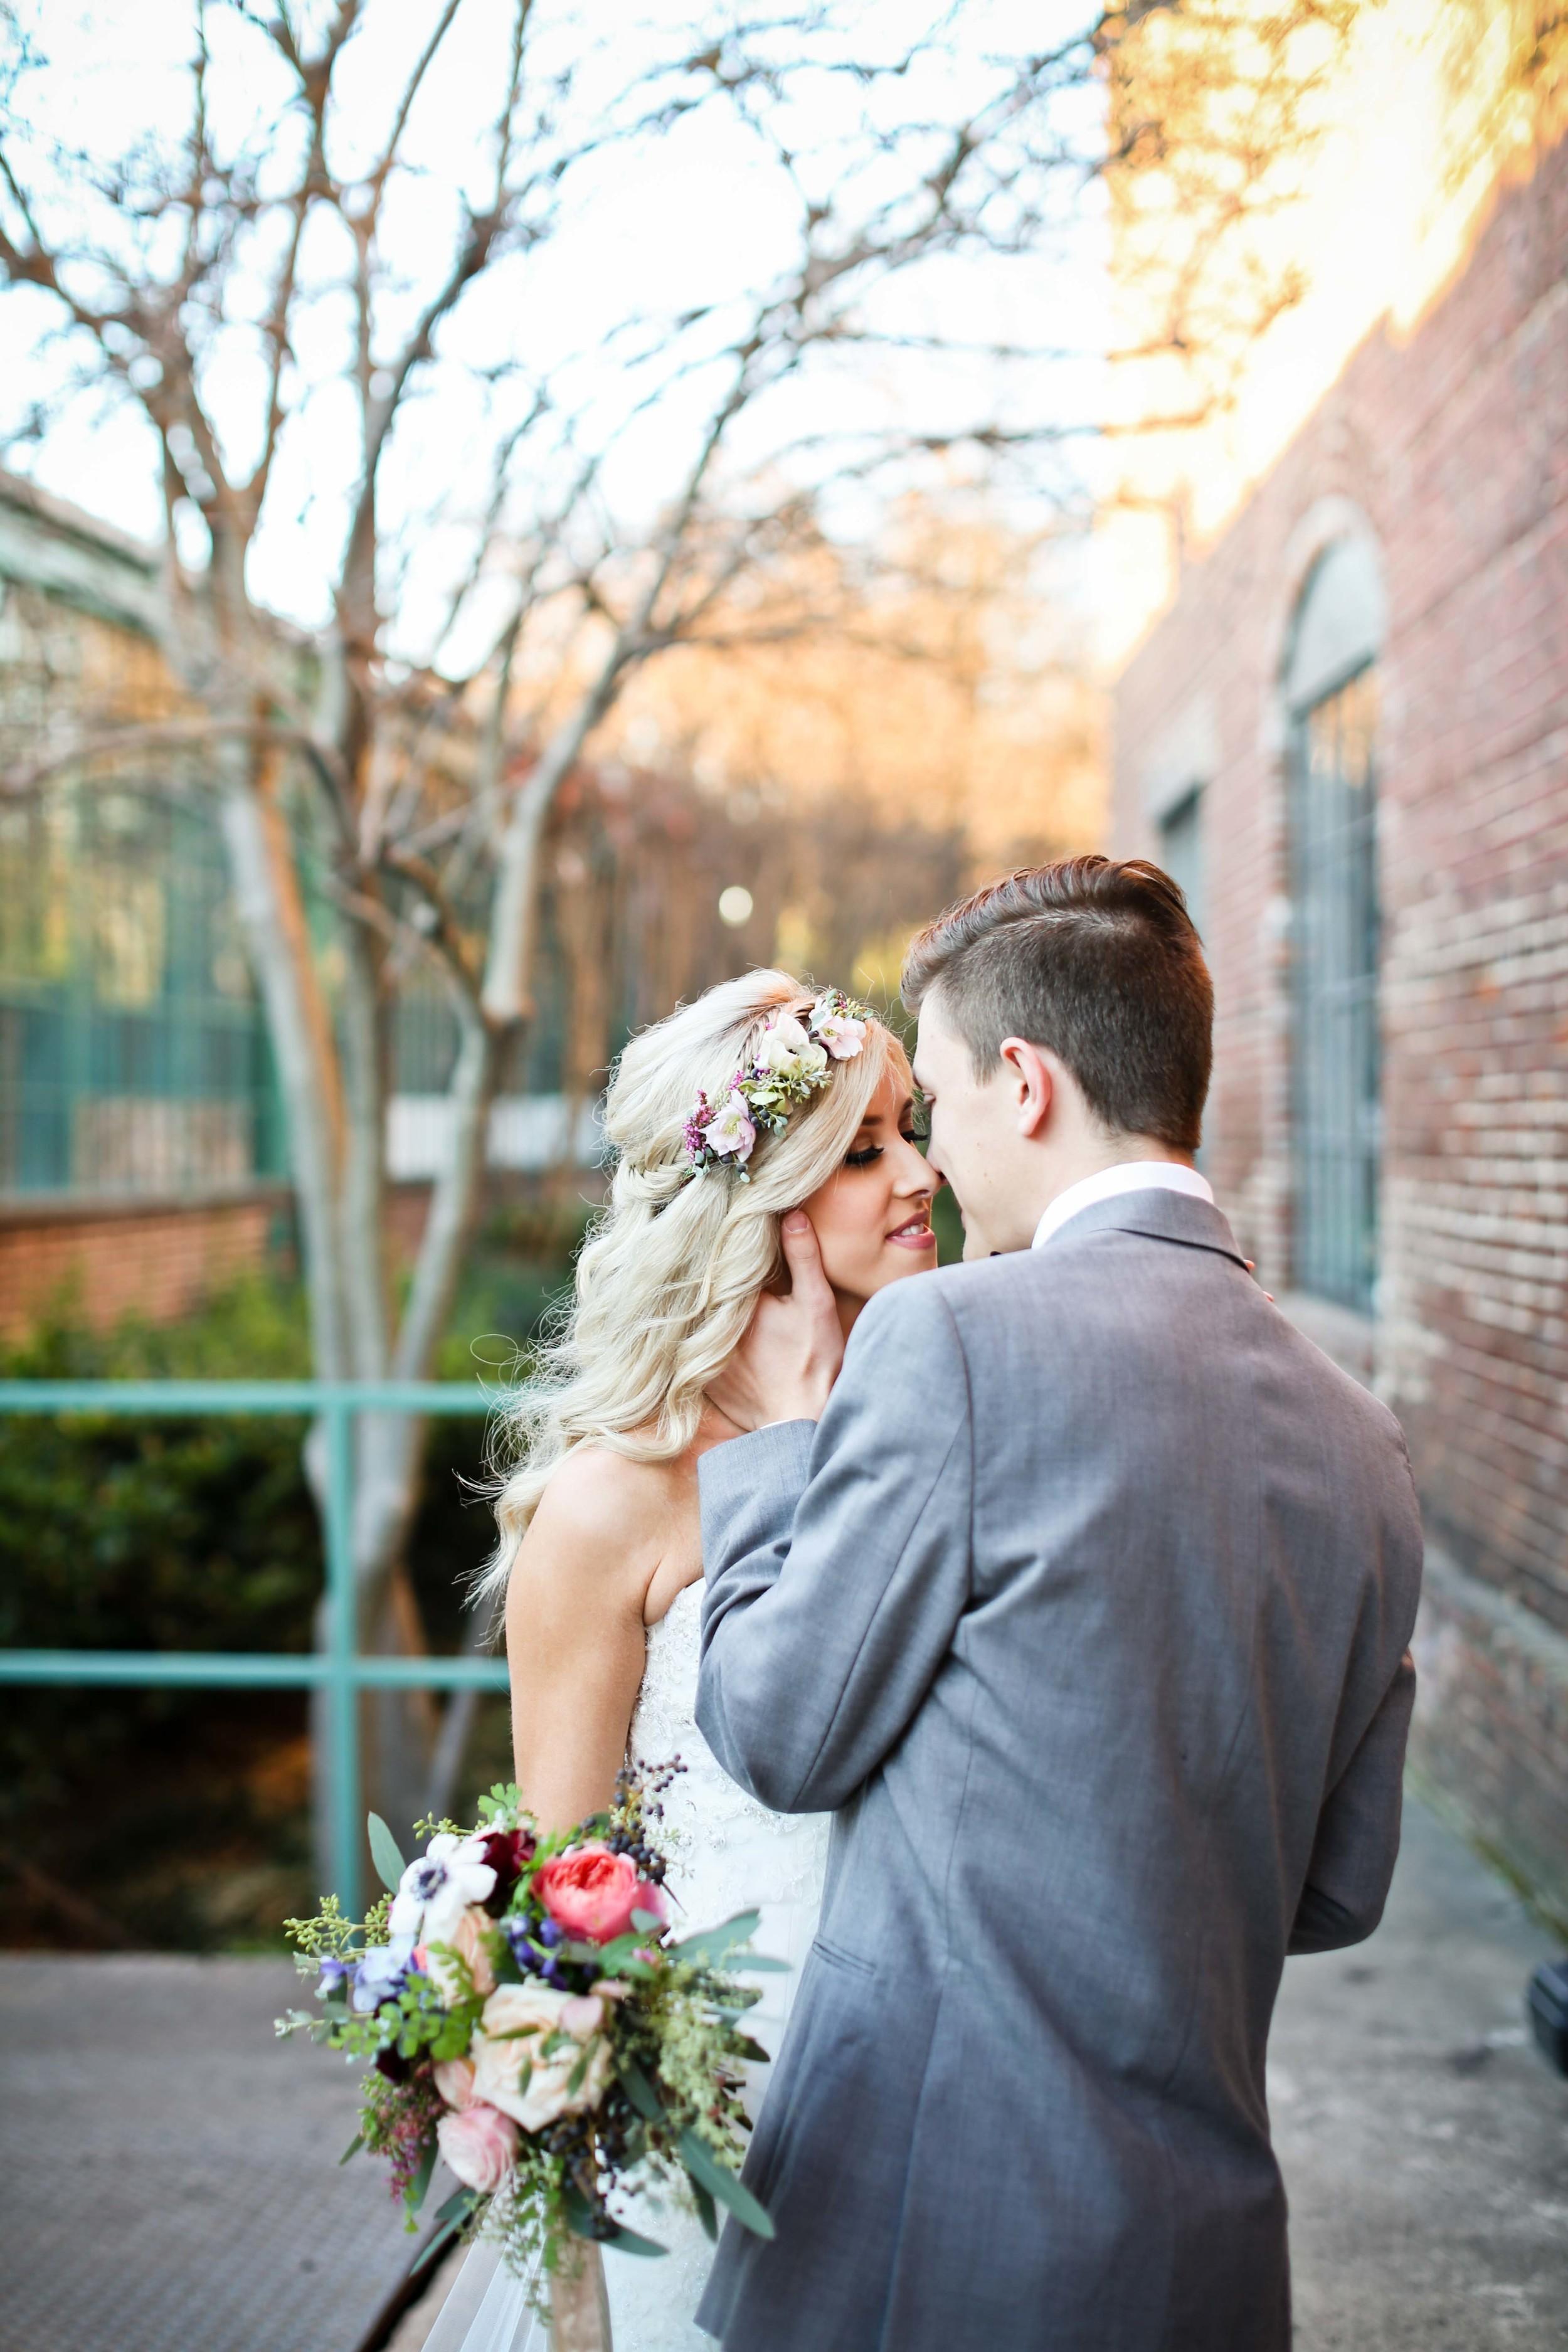 Romantic Elopement in Atlanta // Southeast Floral Design